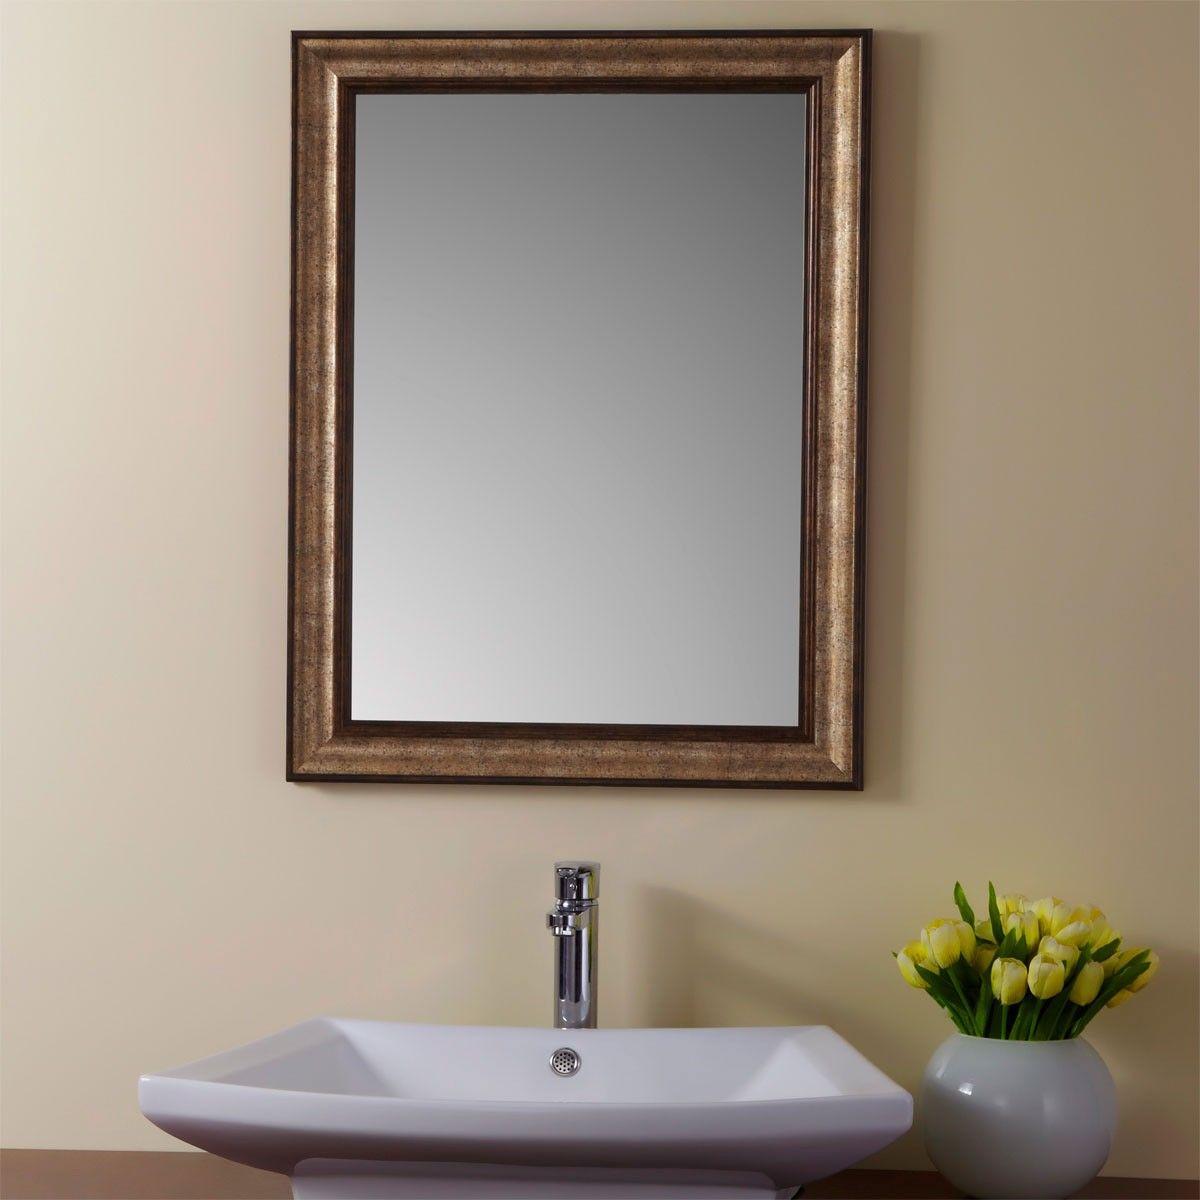 Miroir cadre bois salle de bain for Miroir 3 volets salle de bain